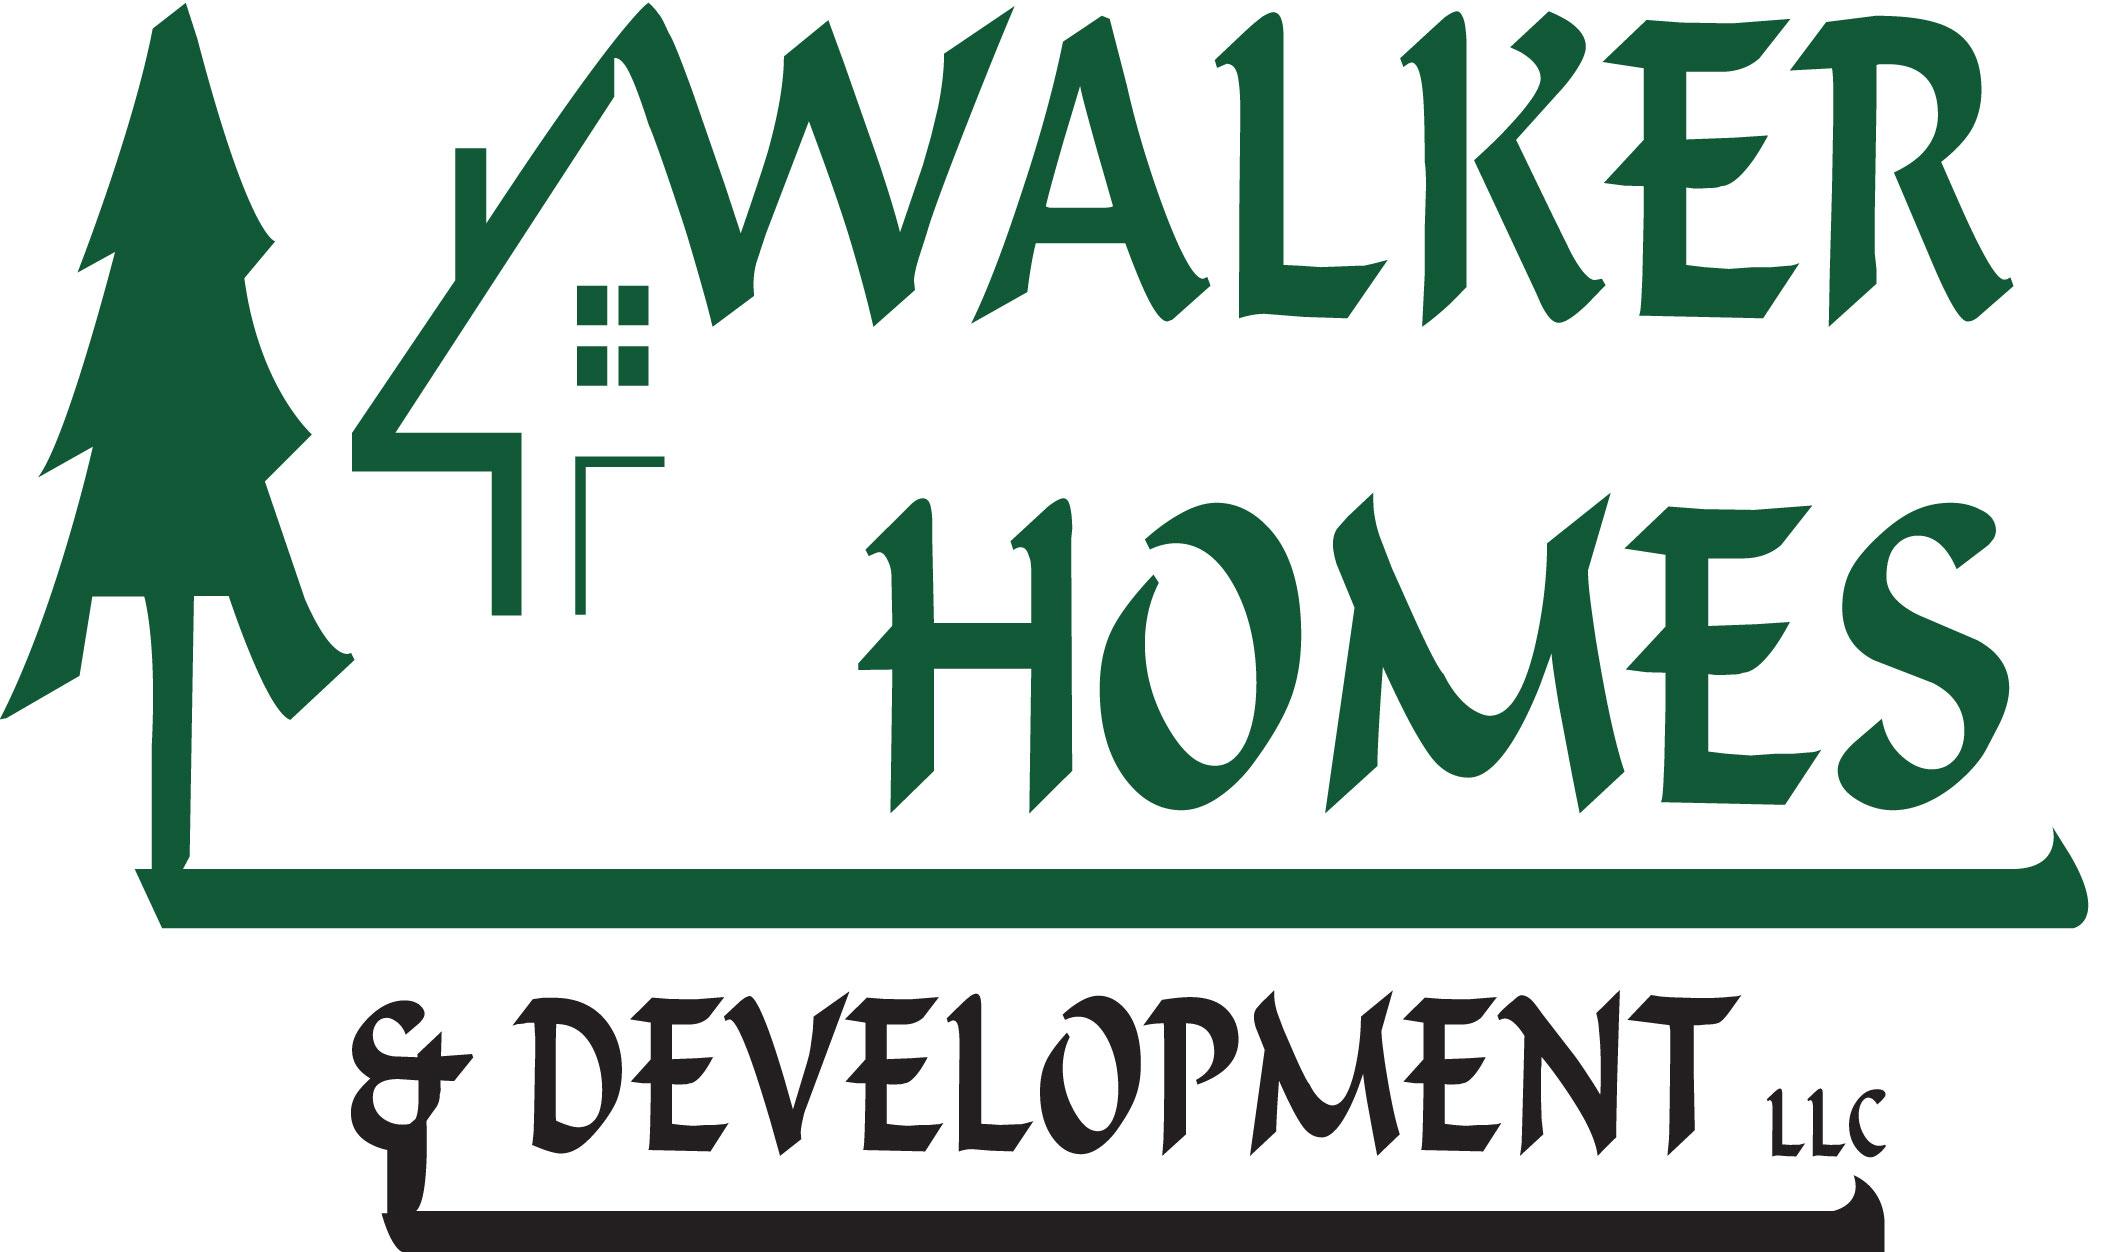 Walker Homes Logo-jpeg.jpg